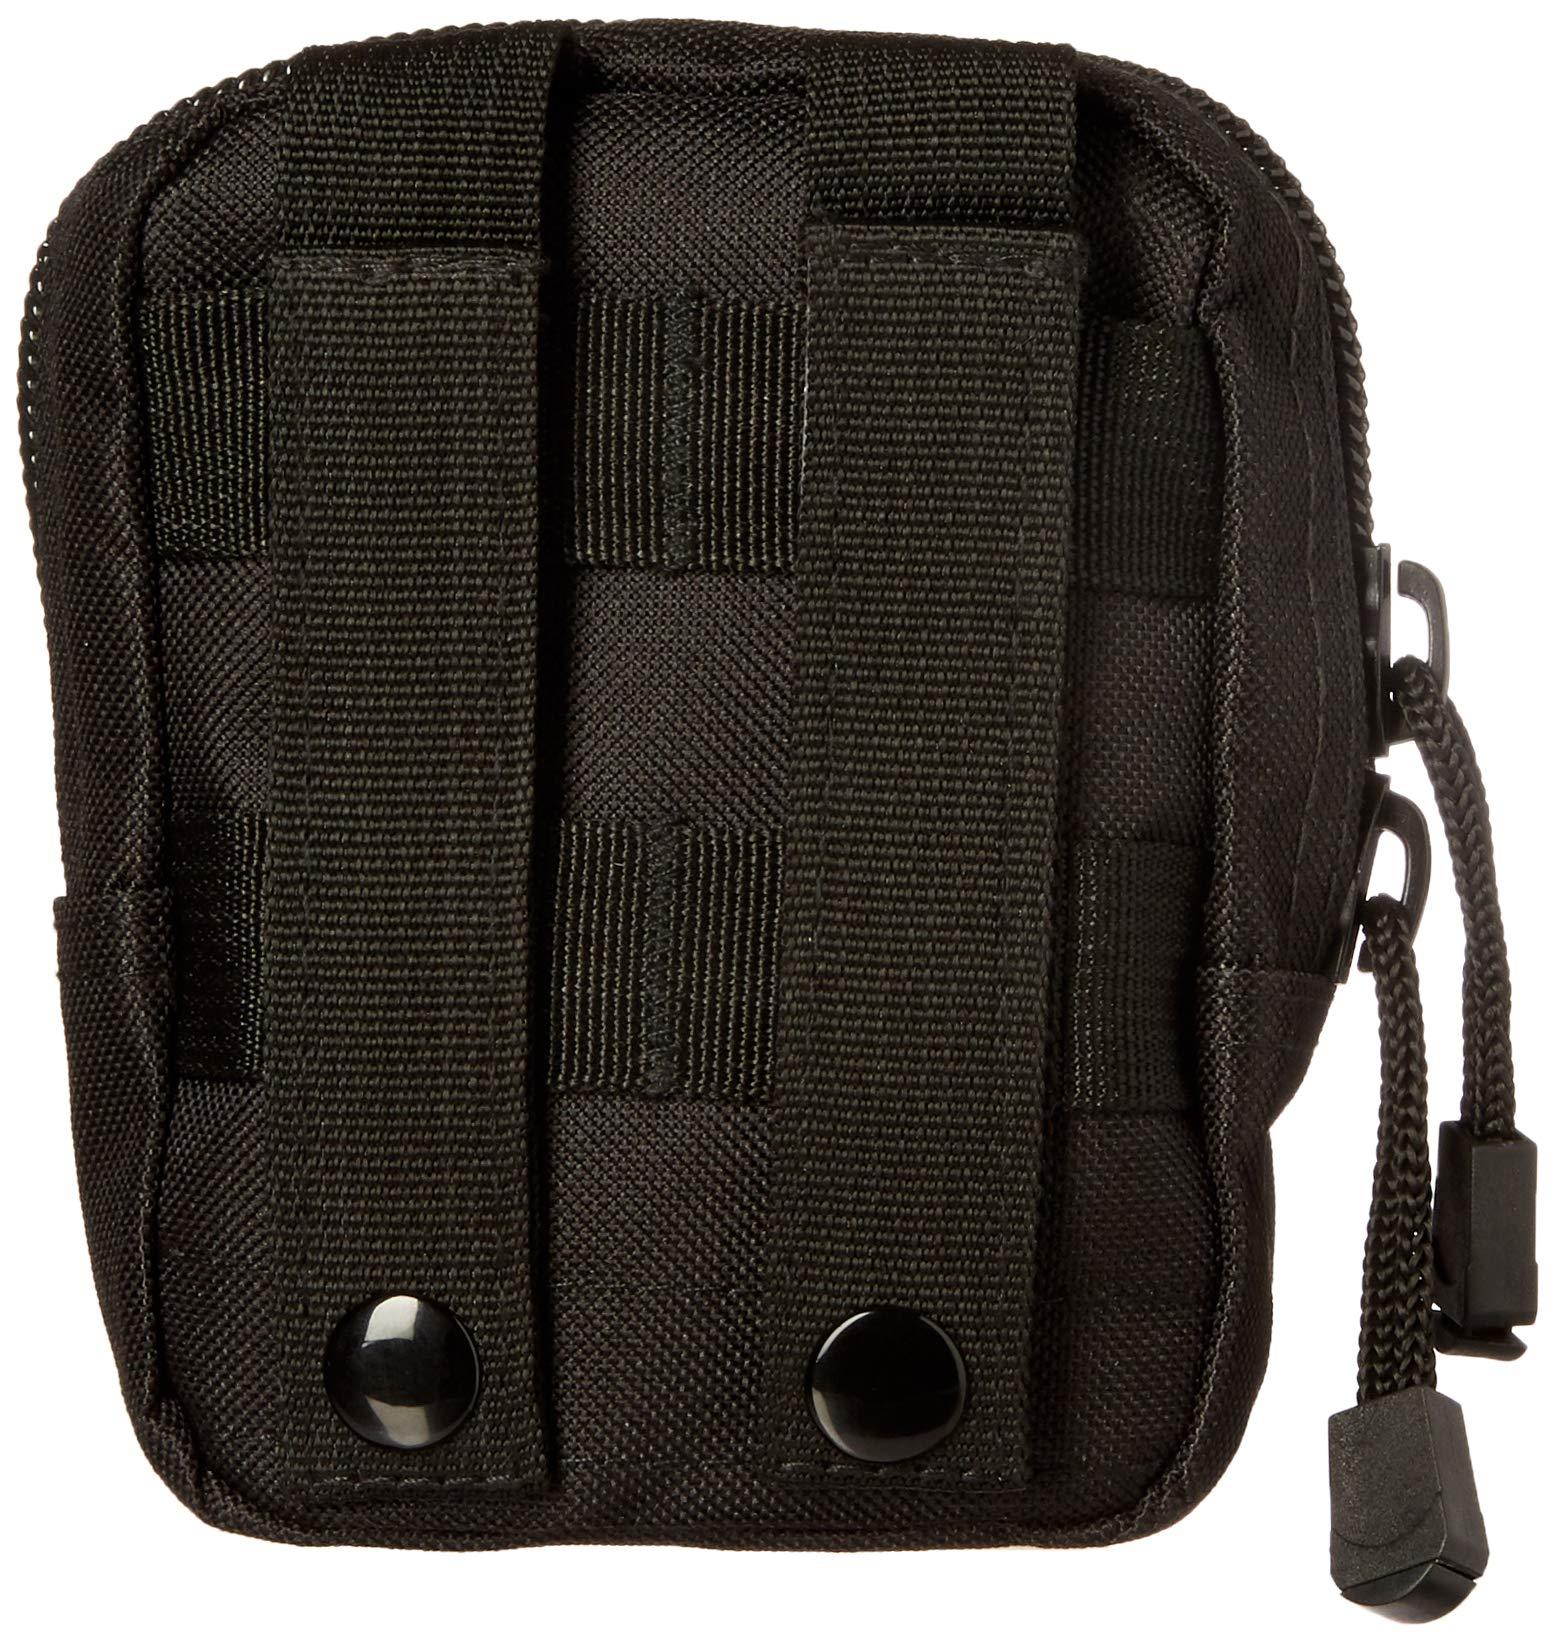 NcStar Compact Trauma Kit 1 Black by NcSTAR (Image #2)